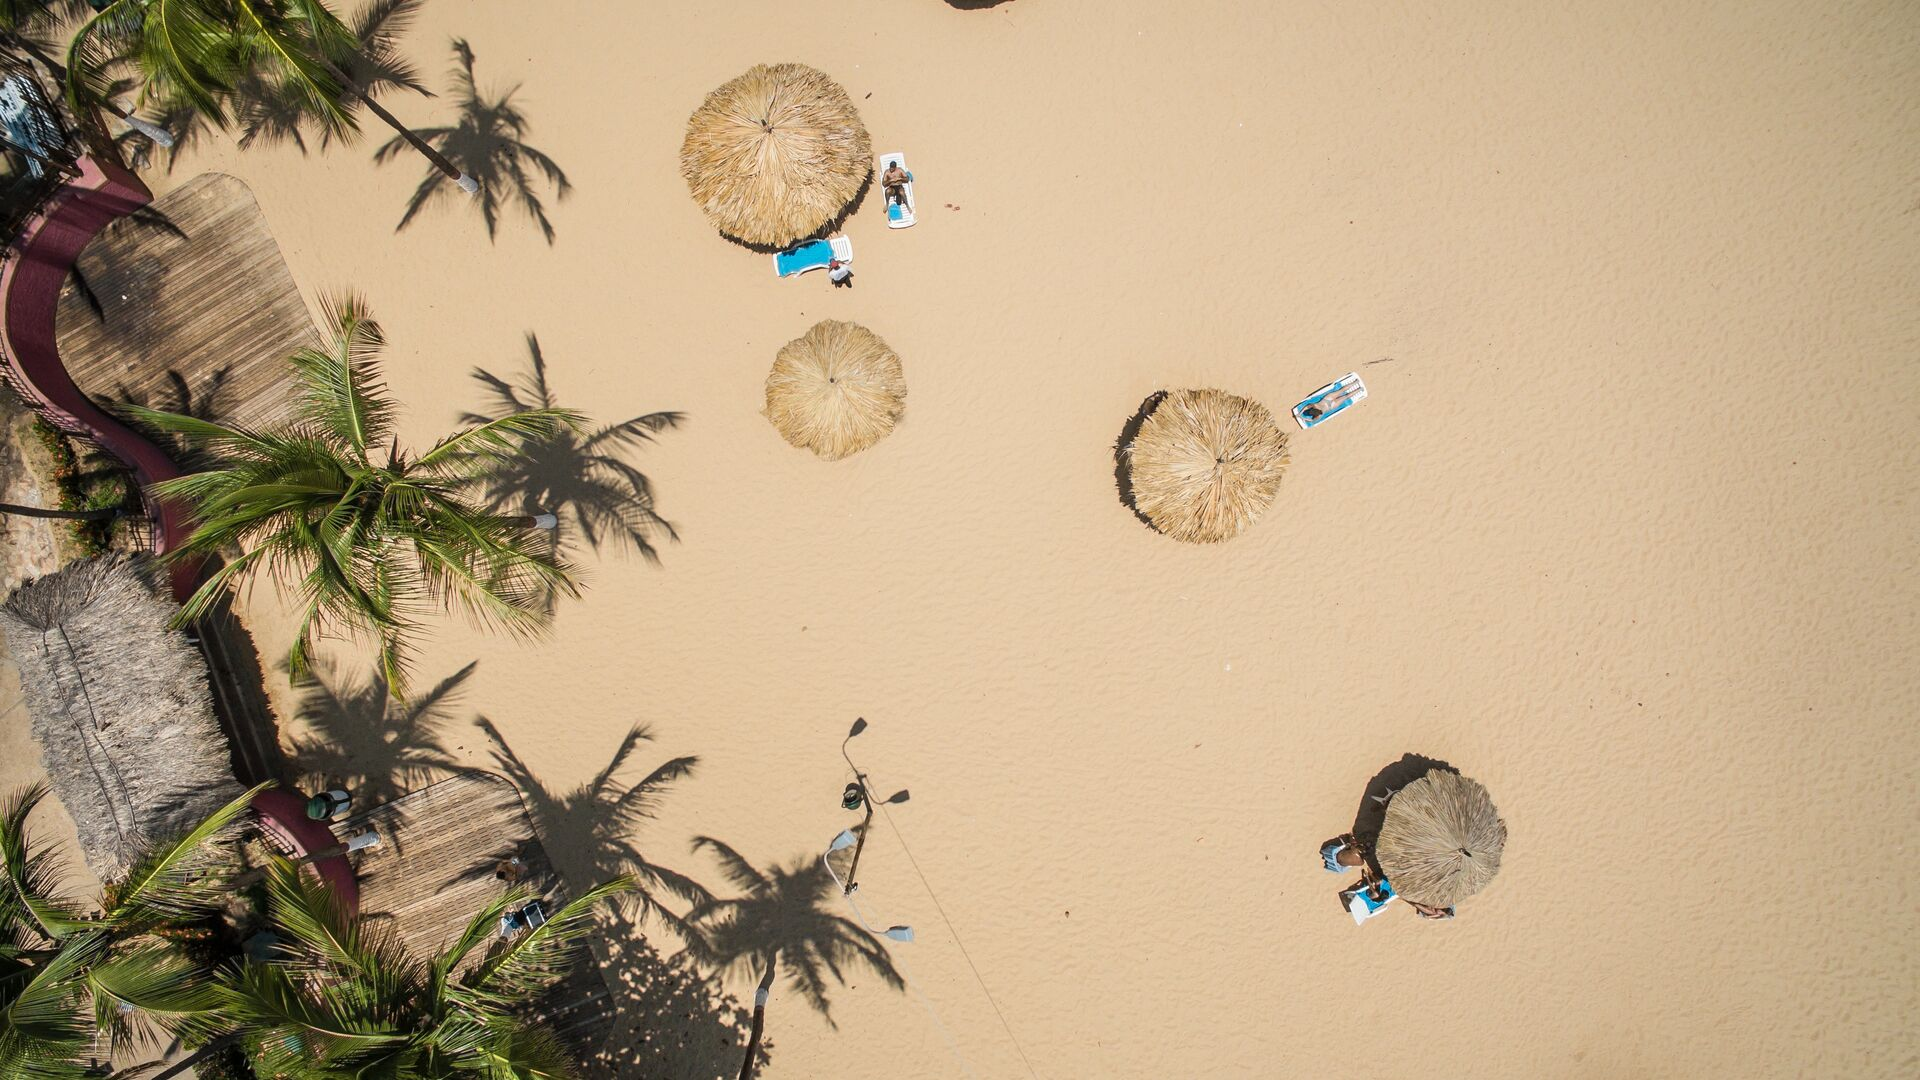 Playa en Venezuela (Archivo) - Sputnik Mundo, 1920, 11.06.2021